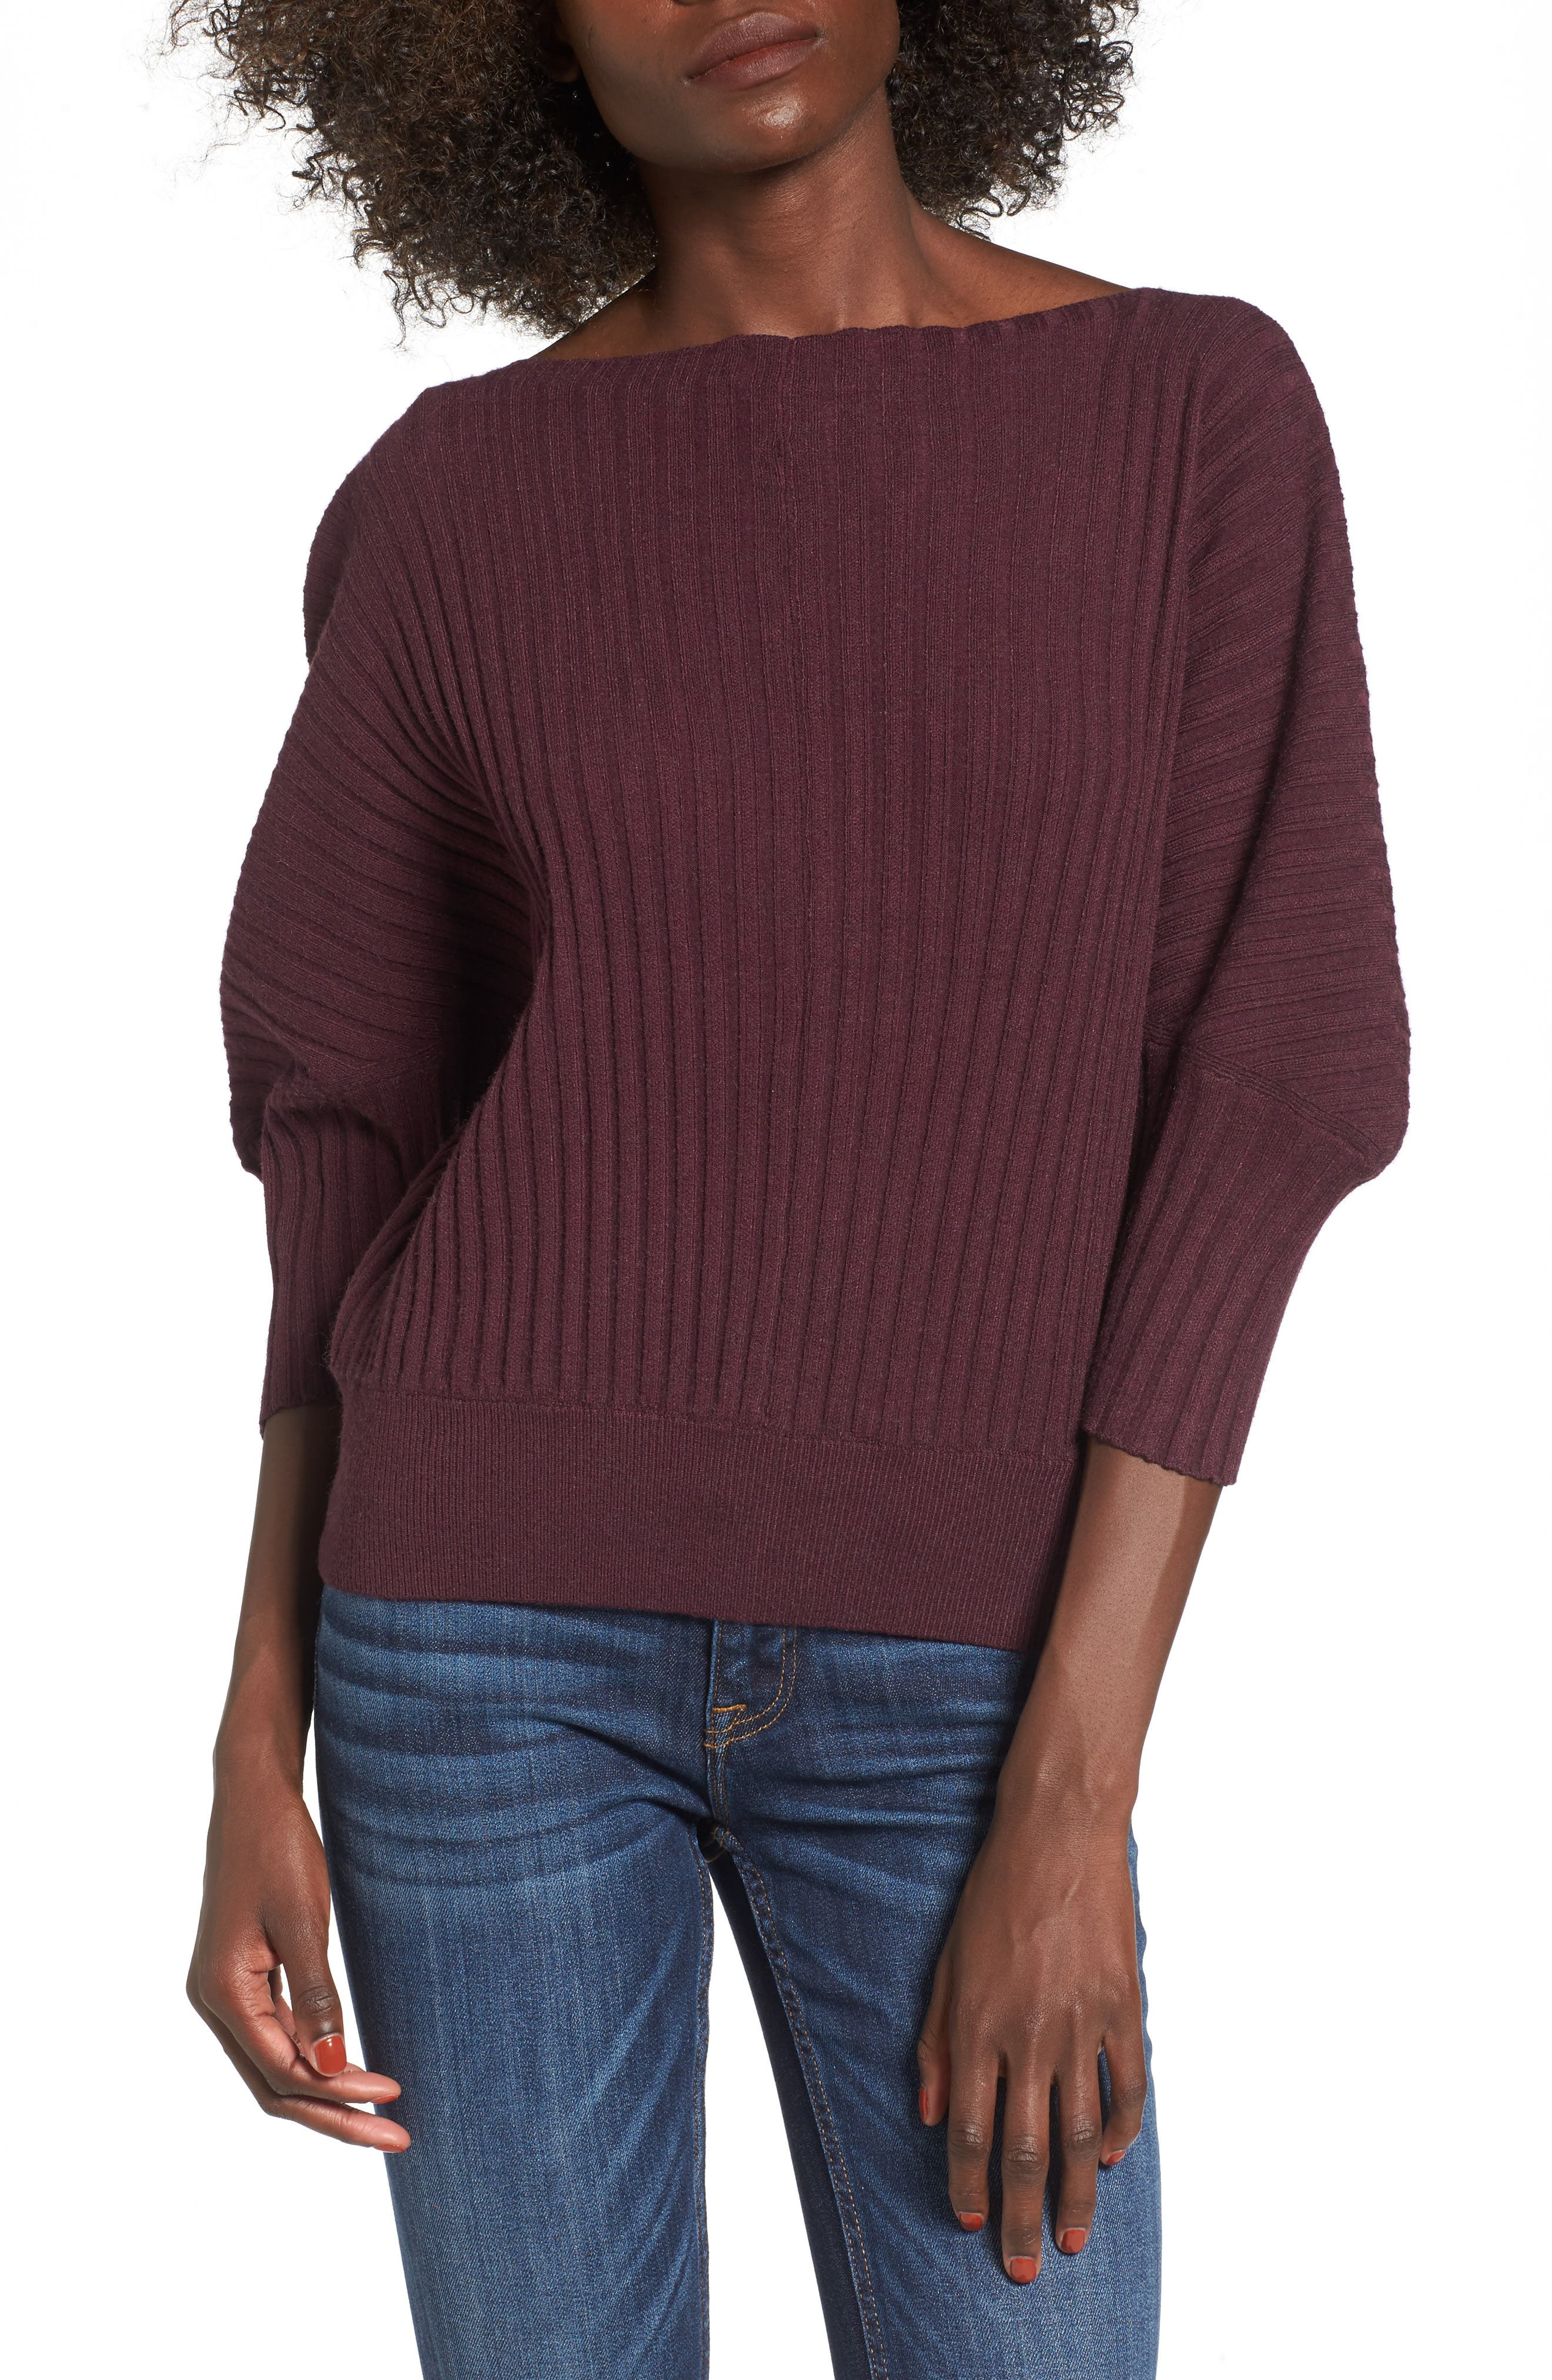 J.O.A. Rib Knit Blouson Sweater